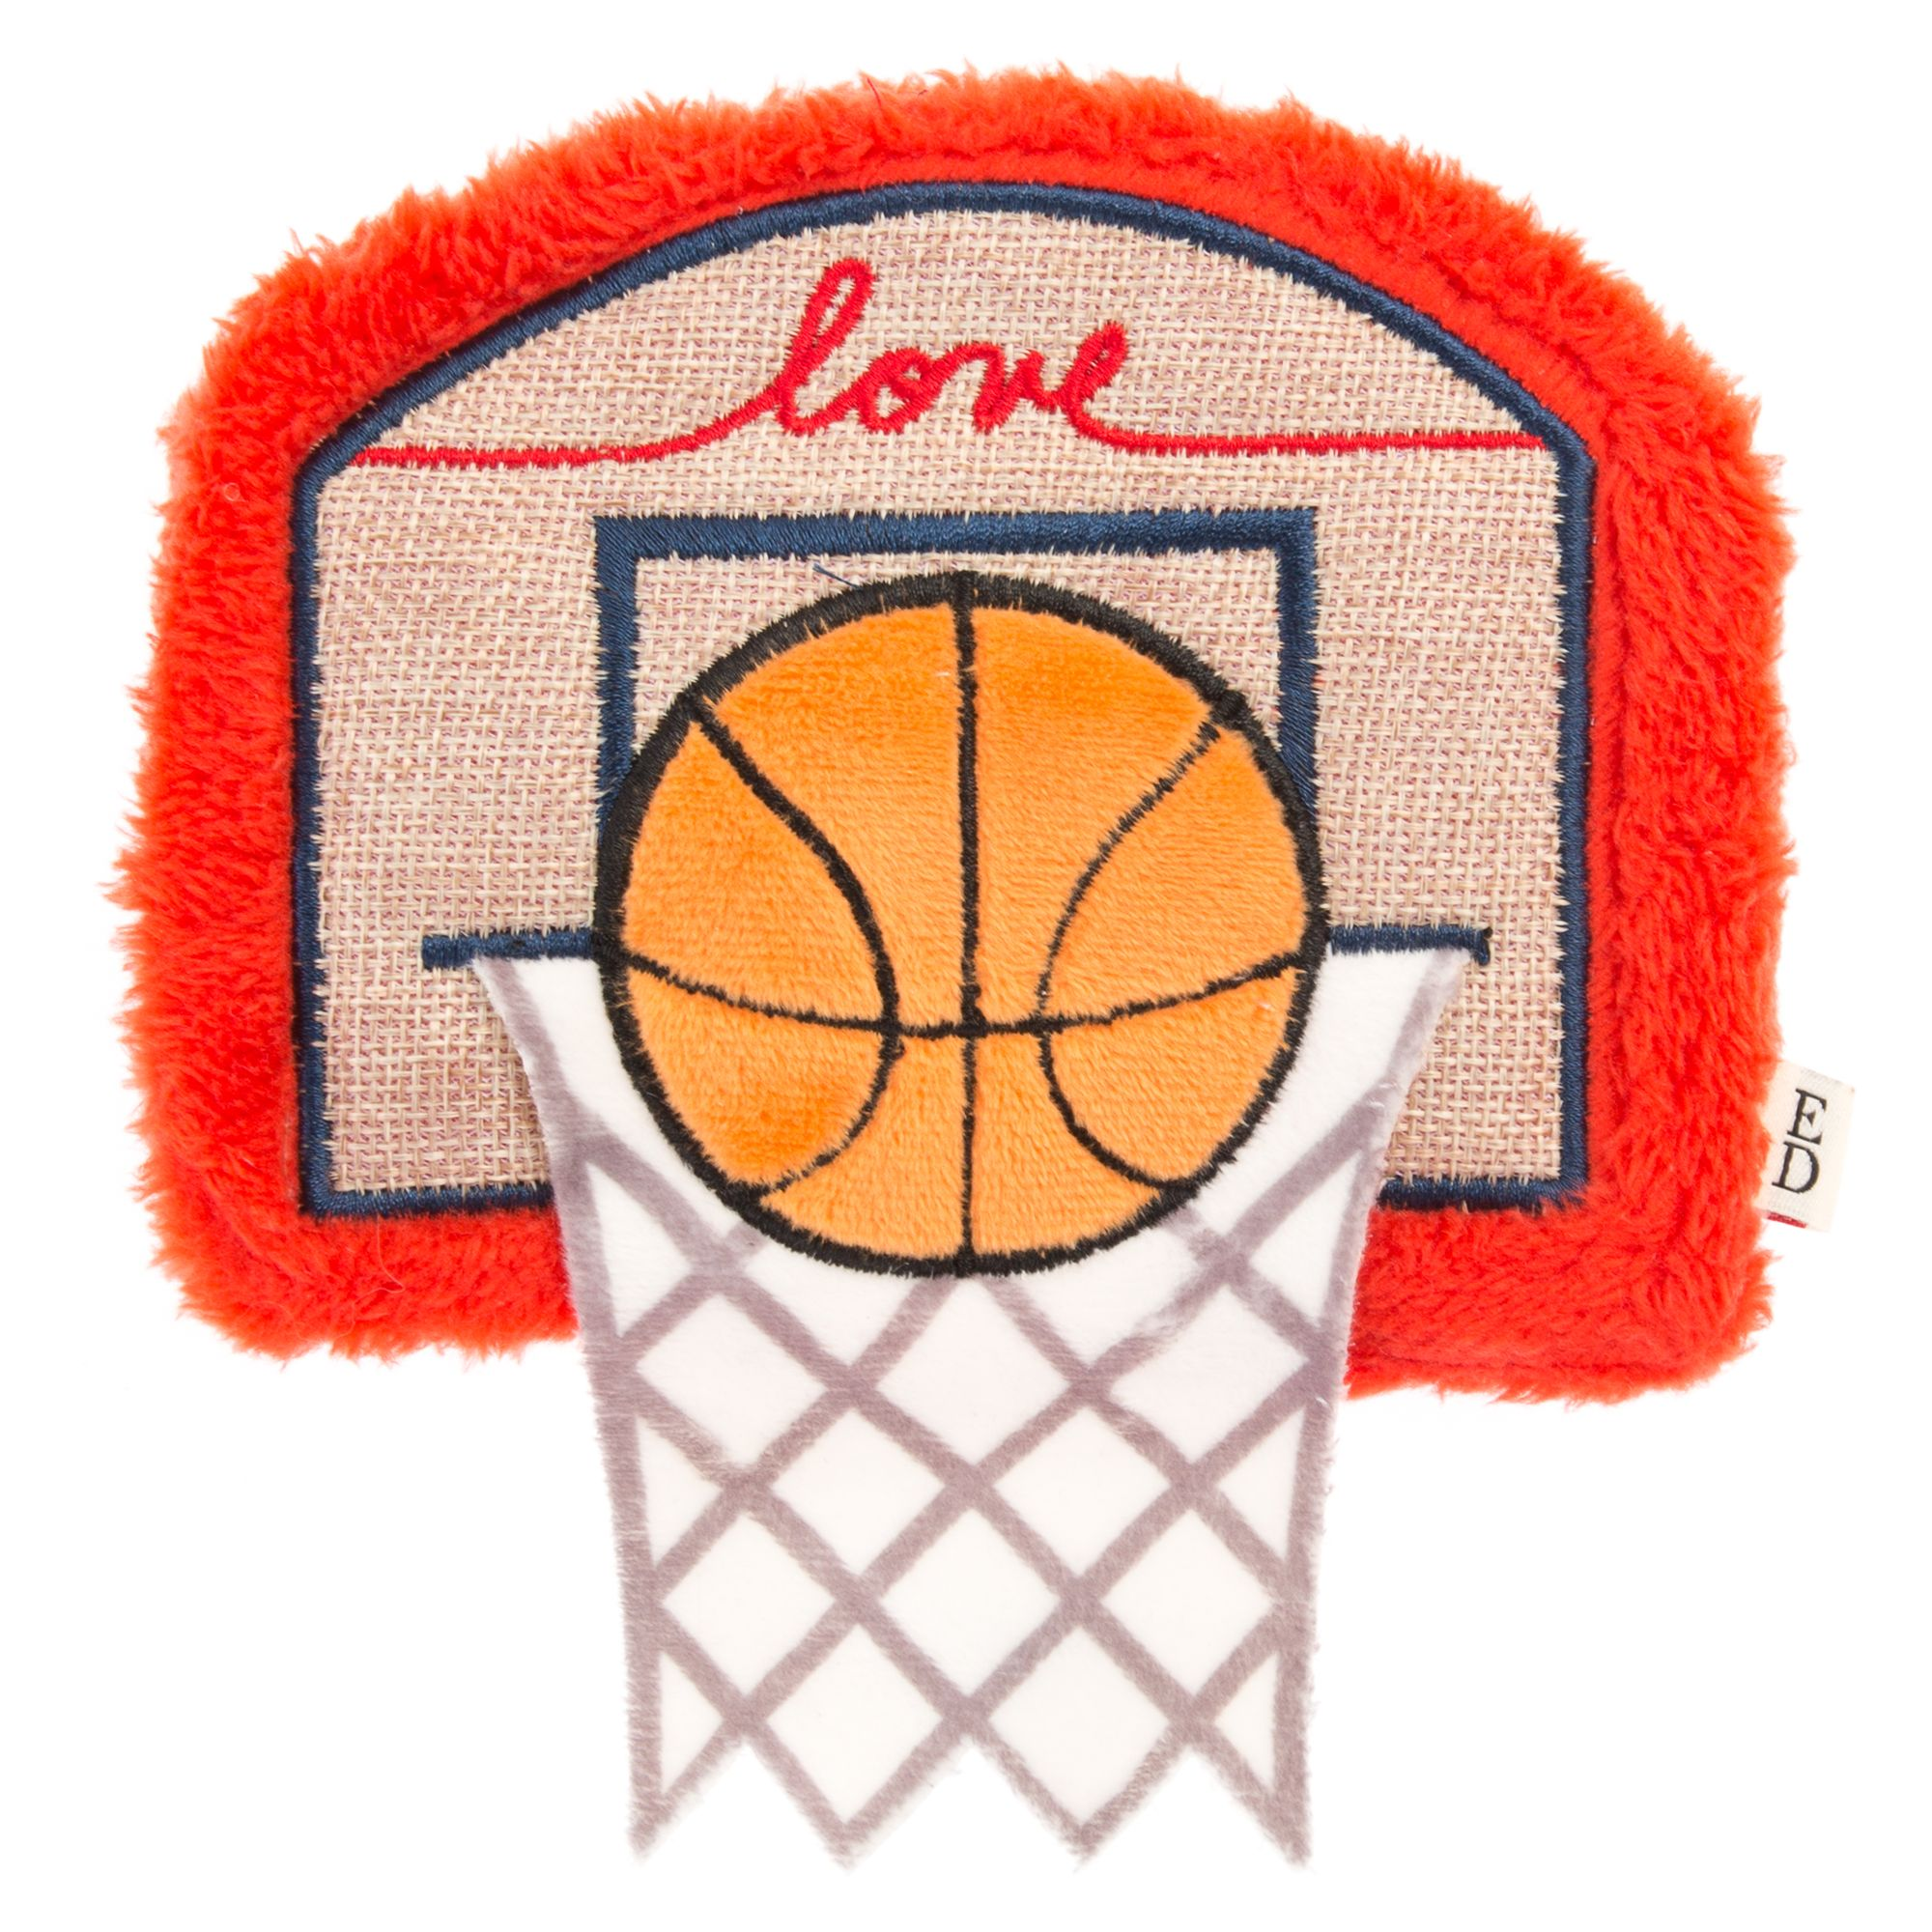 Ed Ellen Degeneres Basketball Hoop Dog Toy Plush Squeaker